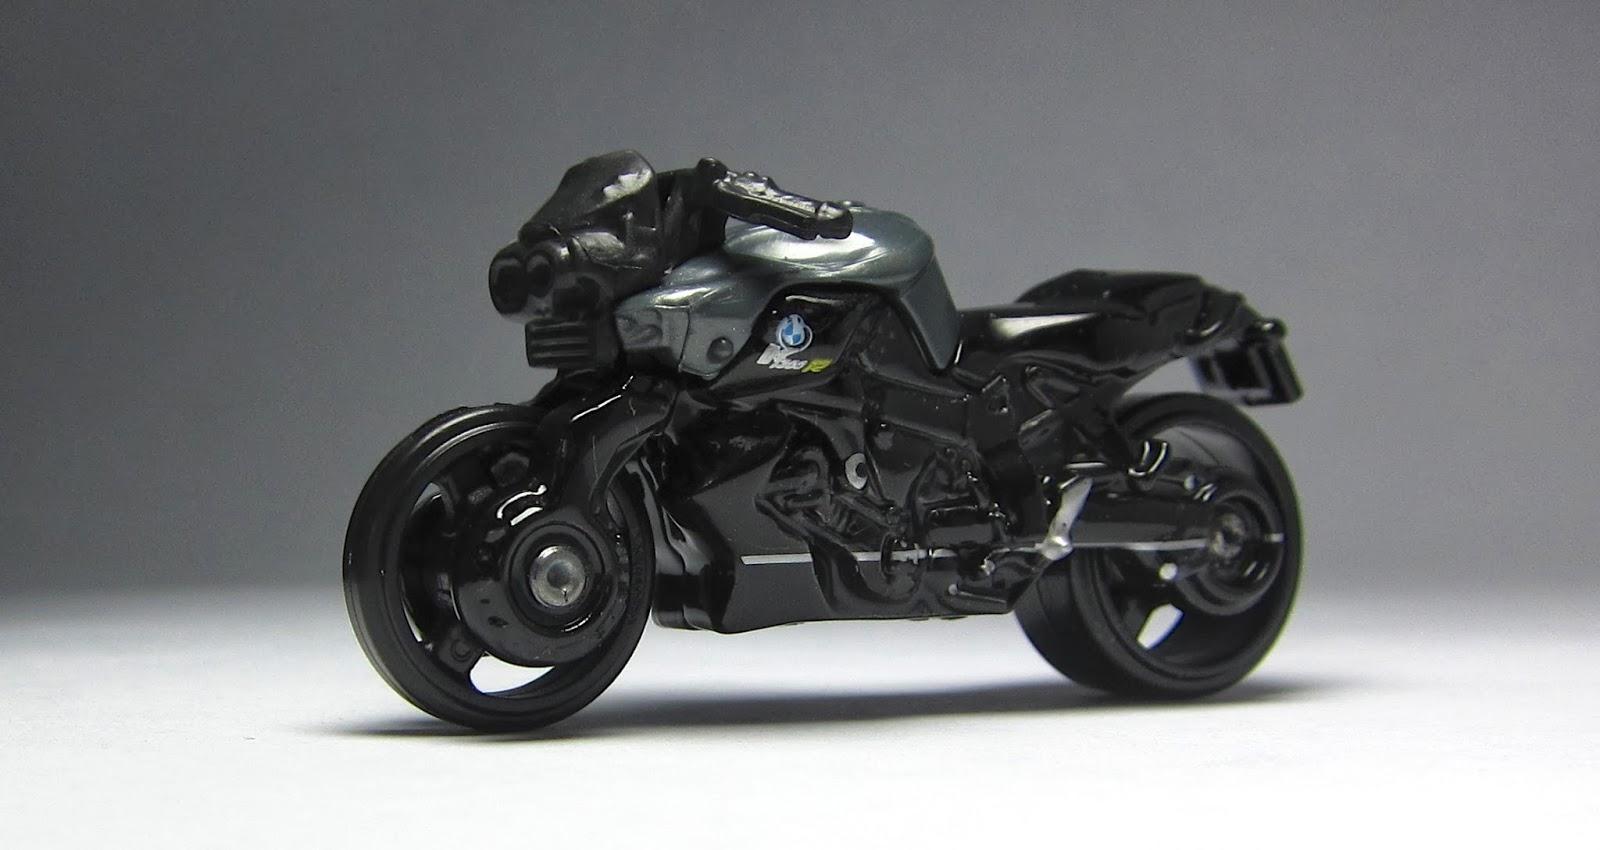 best motorcycle 2014: first look: 2014 hot wheels bmw k1300 r